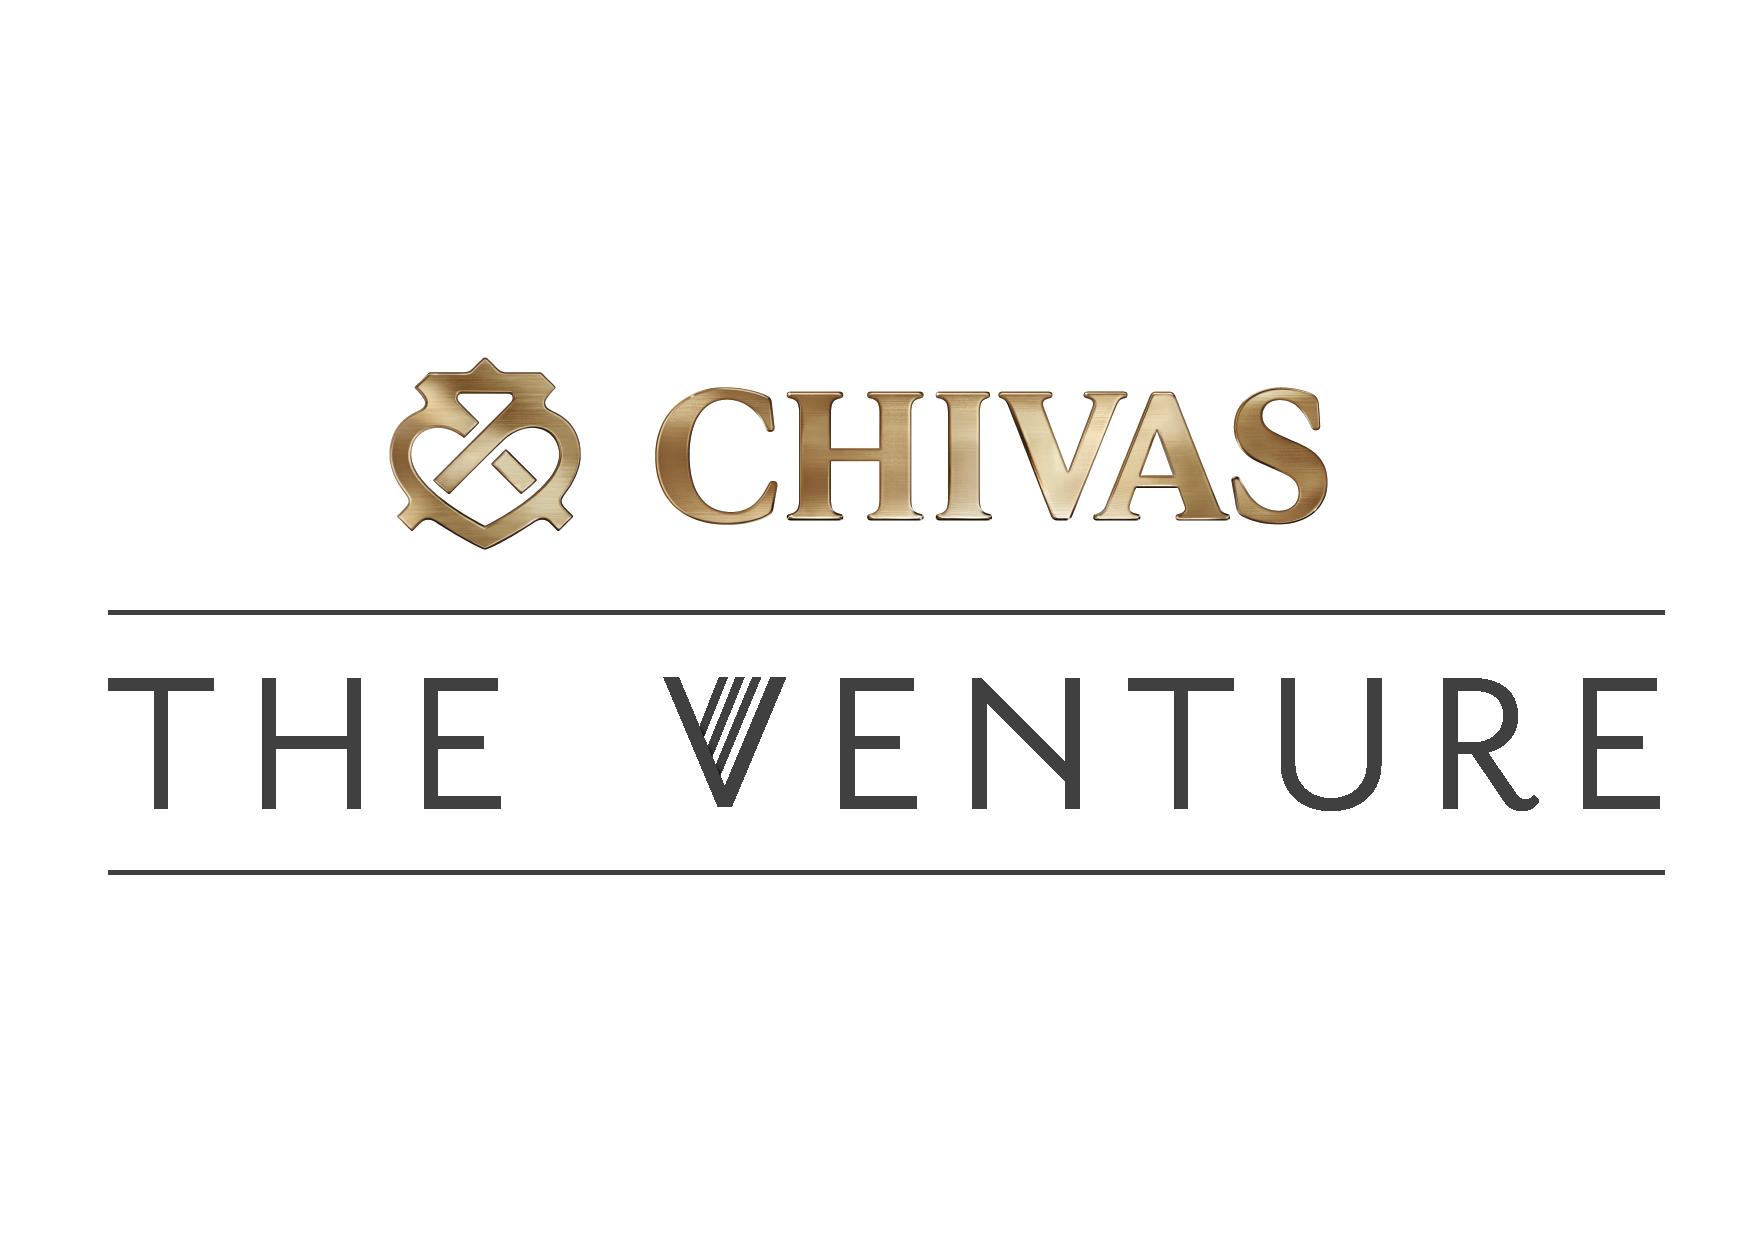 Chivas_TheVenture_Vertical_BLACK.png